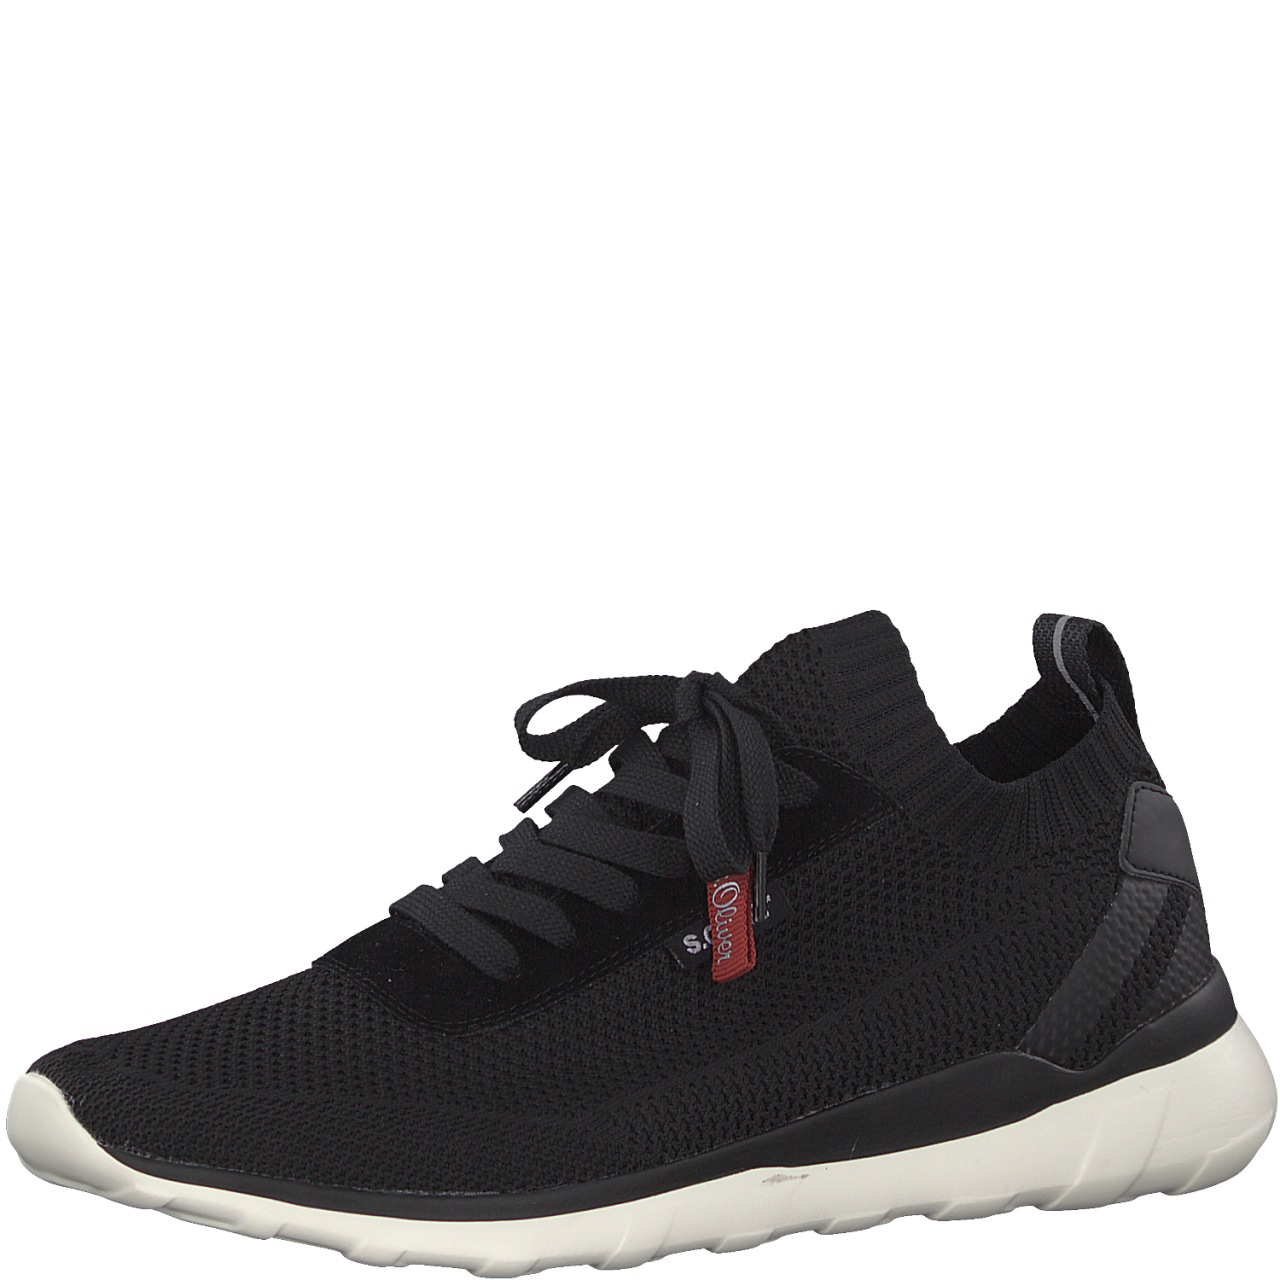 s.Oliver 5 13642 22 leichte Herren Knitwear Sneaker